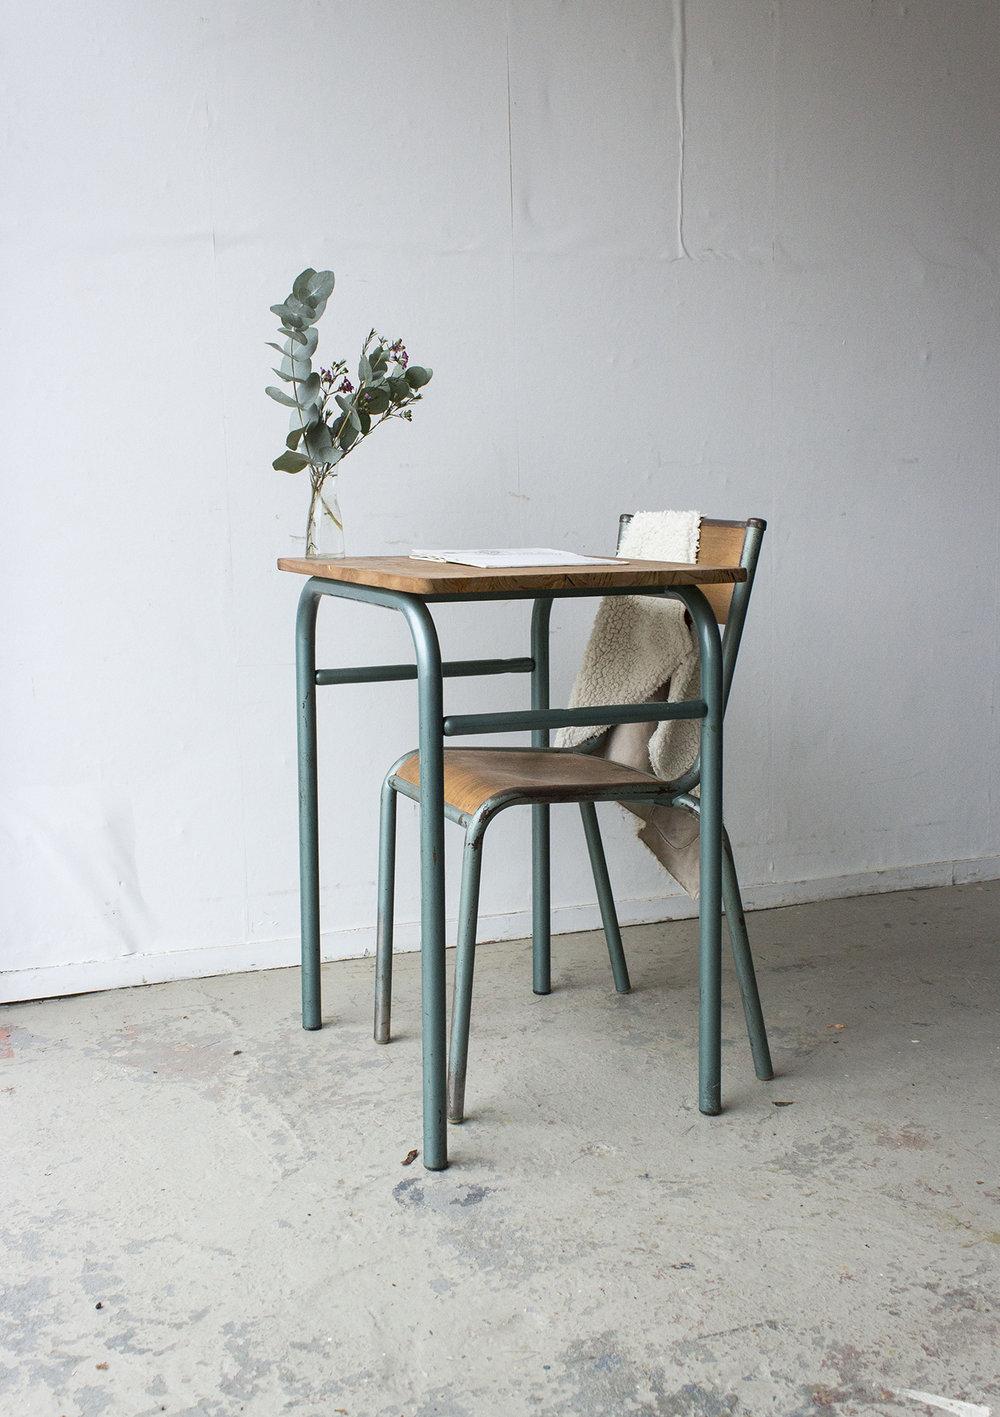 3176 - 1p vintage schooltafel met groen frame - Firma zoethout_1.jpg